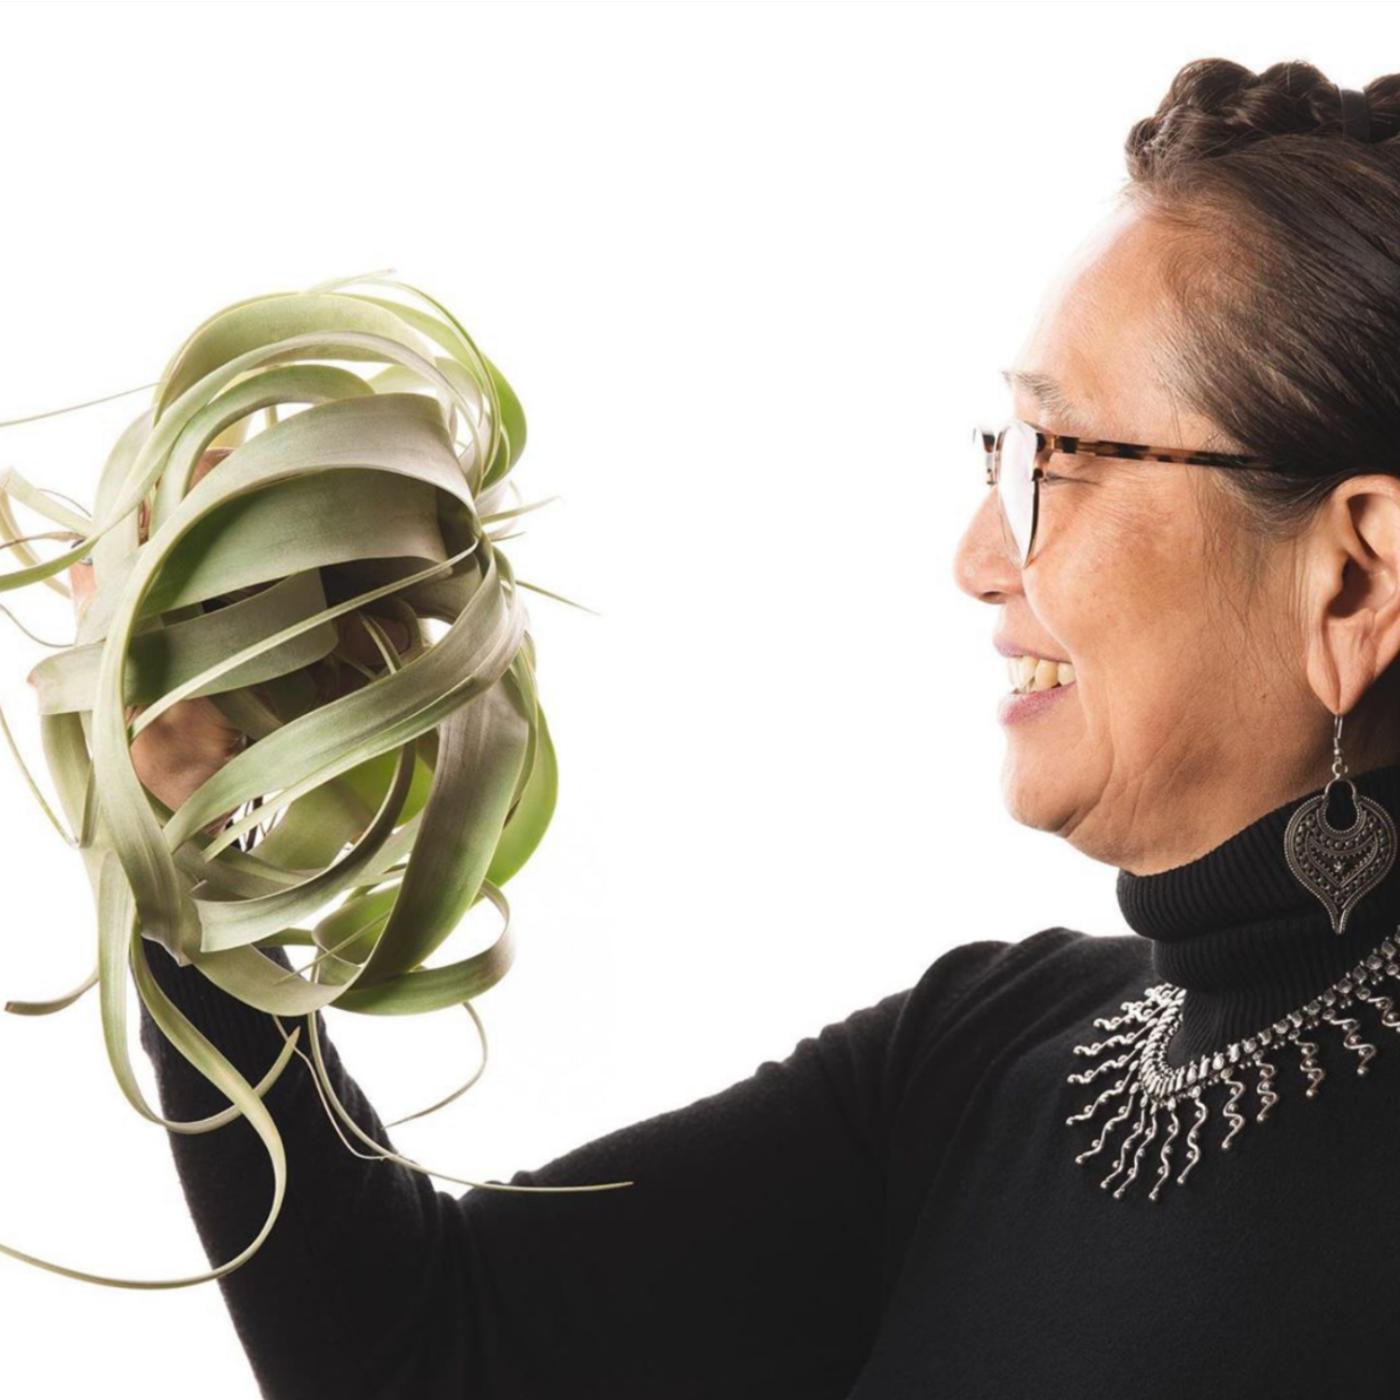 Hitomi Gilliam floral designer and educator smiling holding a succulence for Viva La Flora Live Podcast